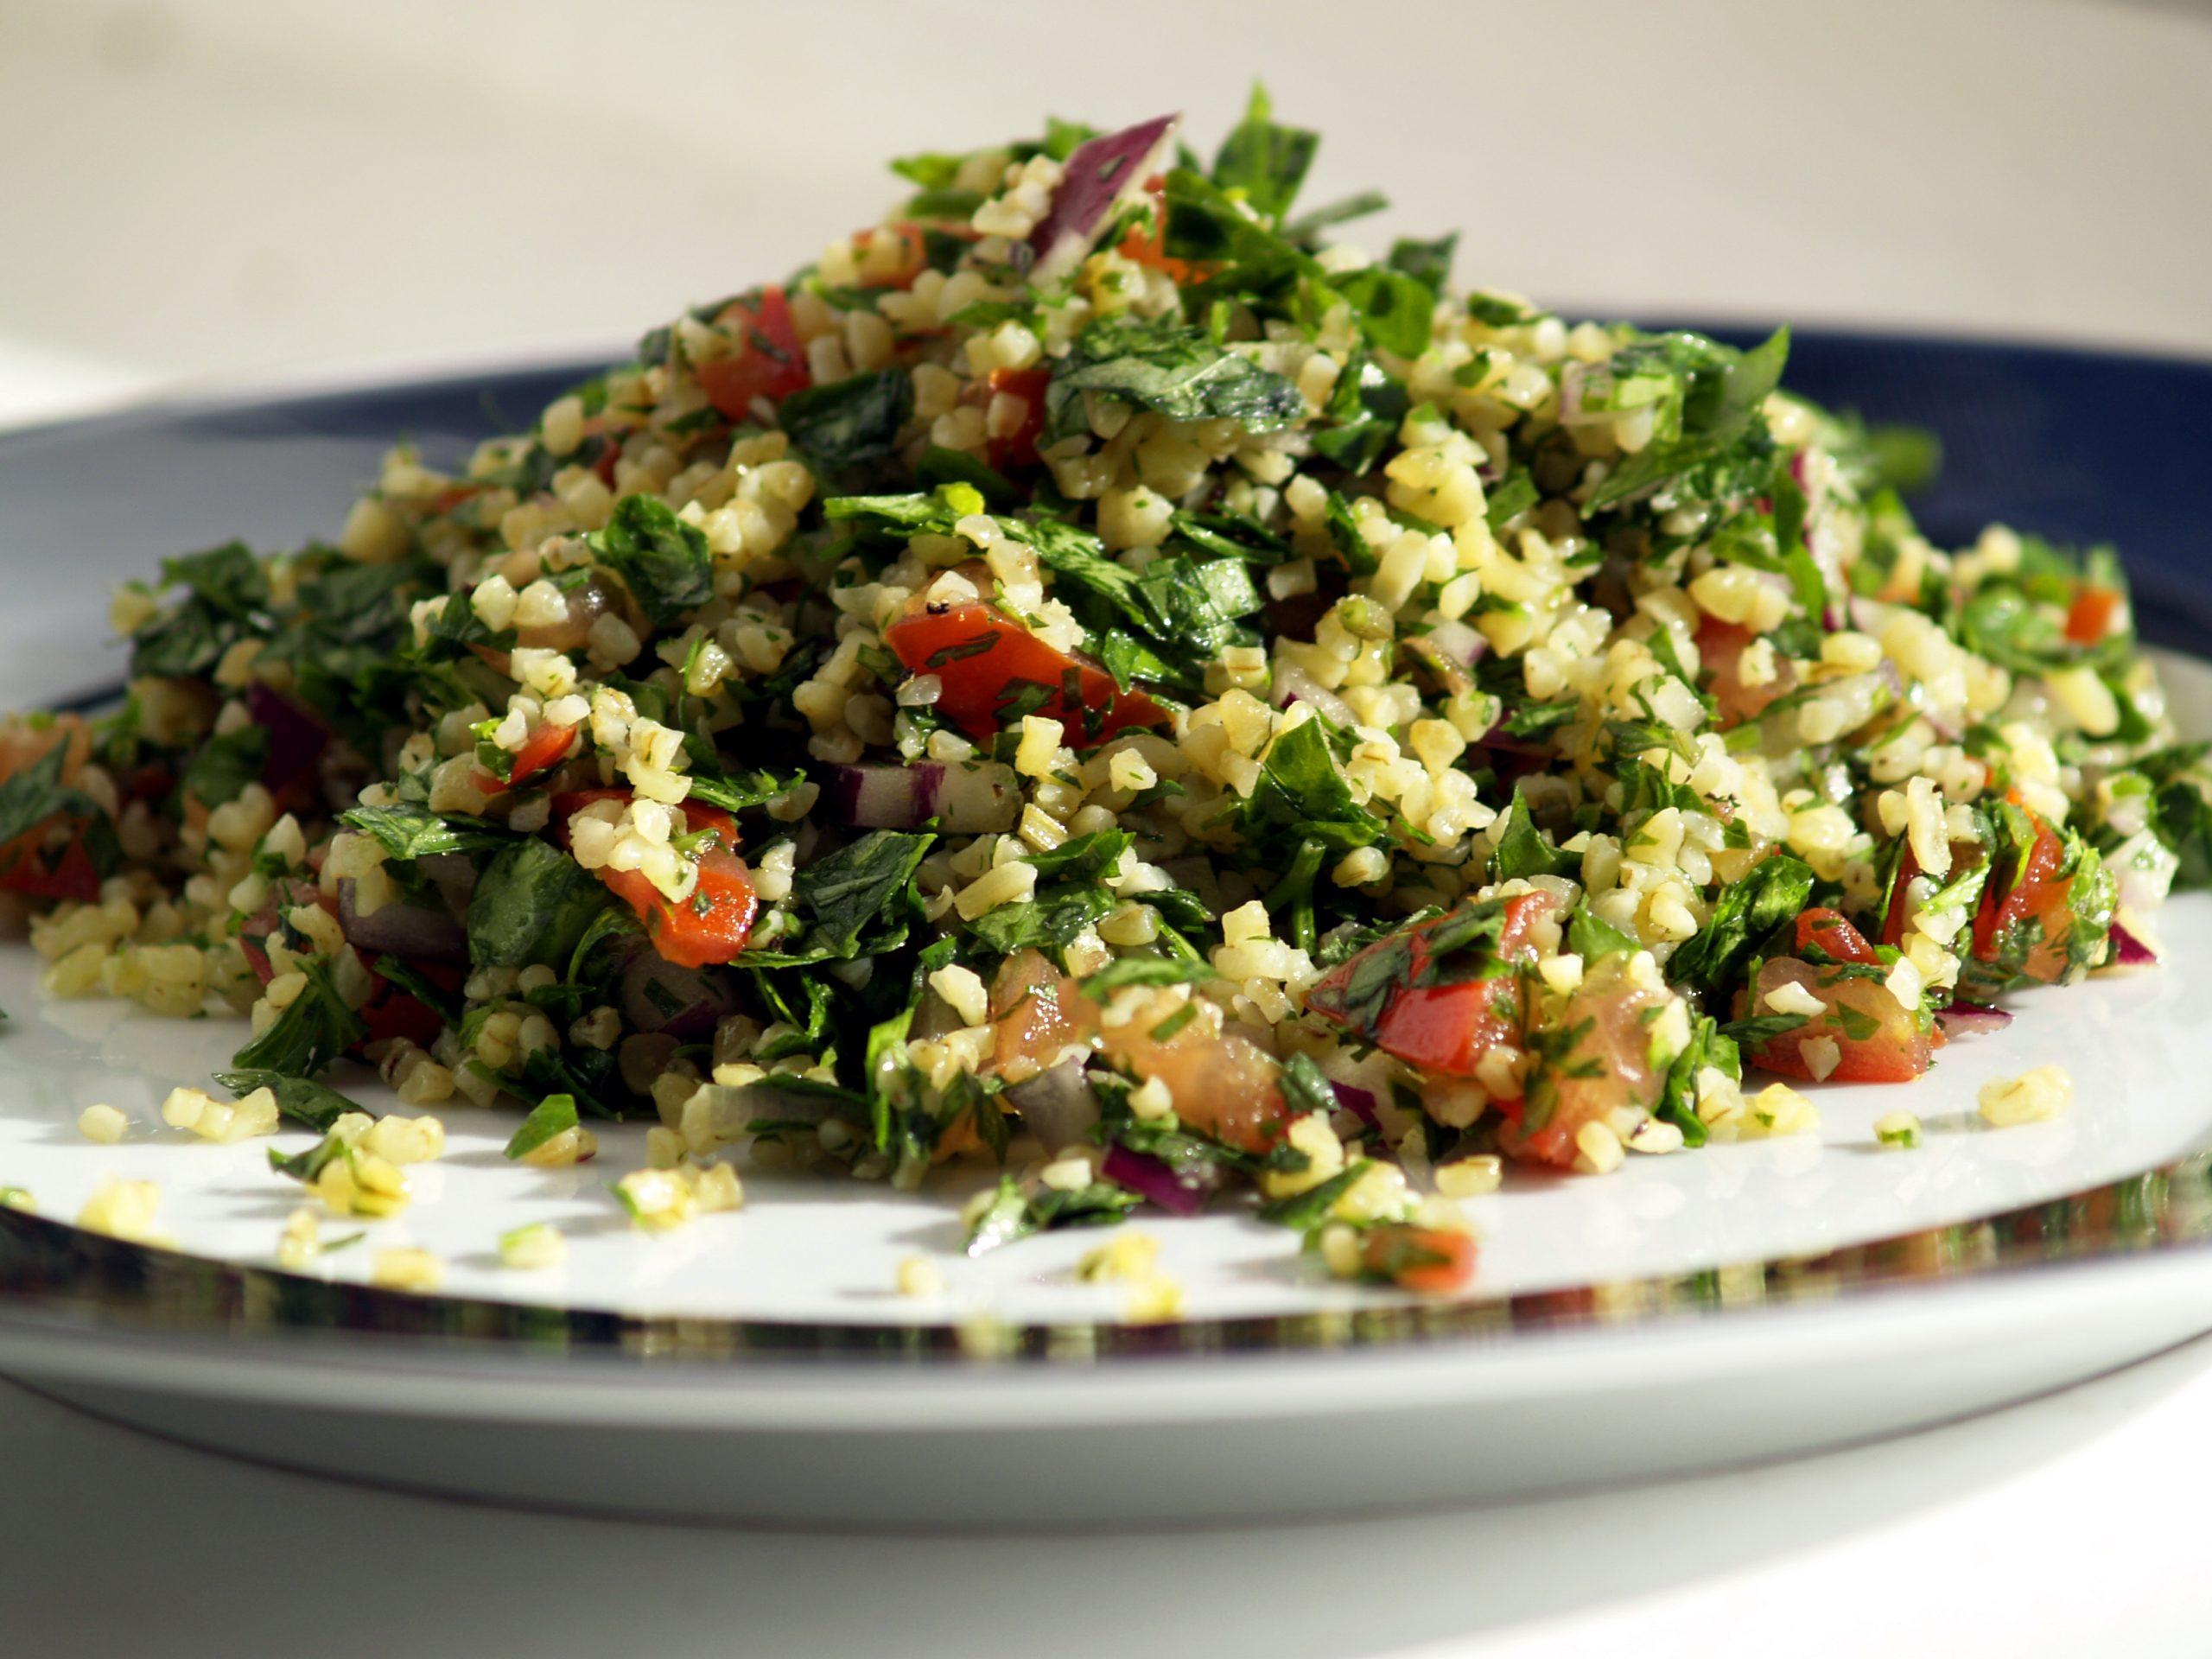 Bagarzan piatto vegetariano ebraico